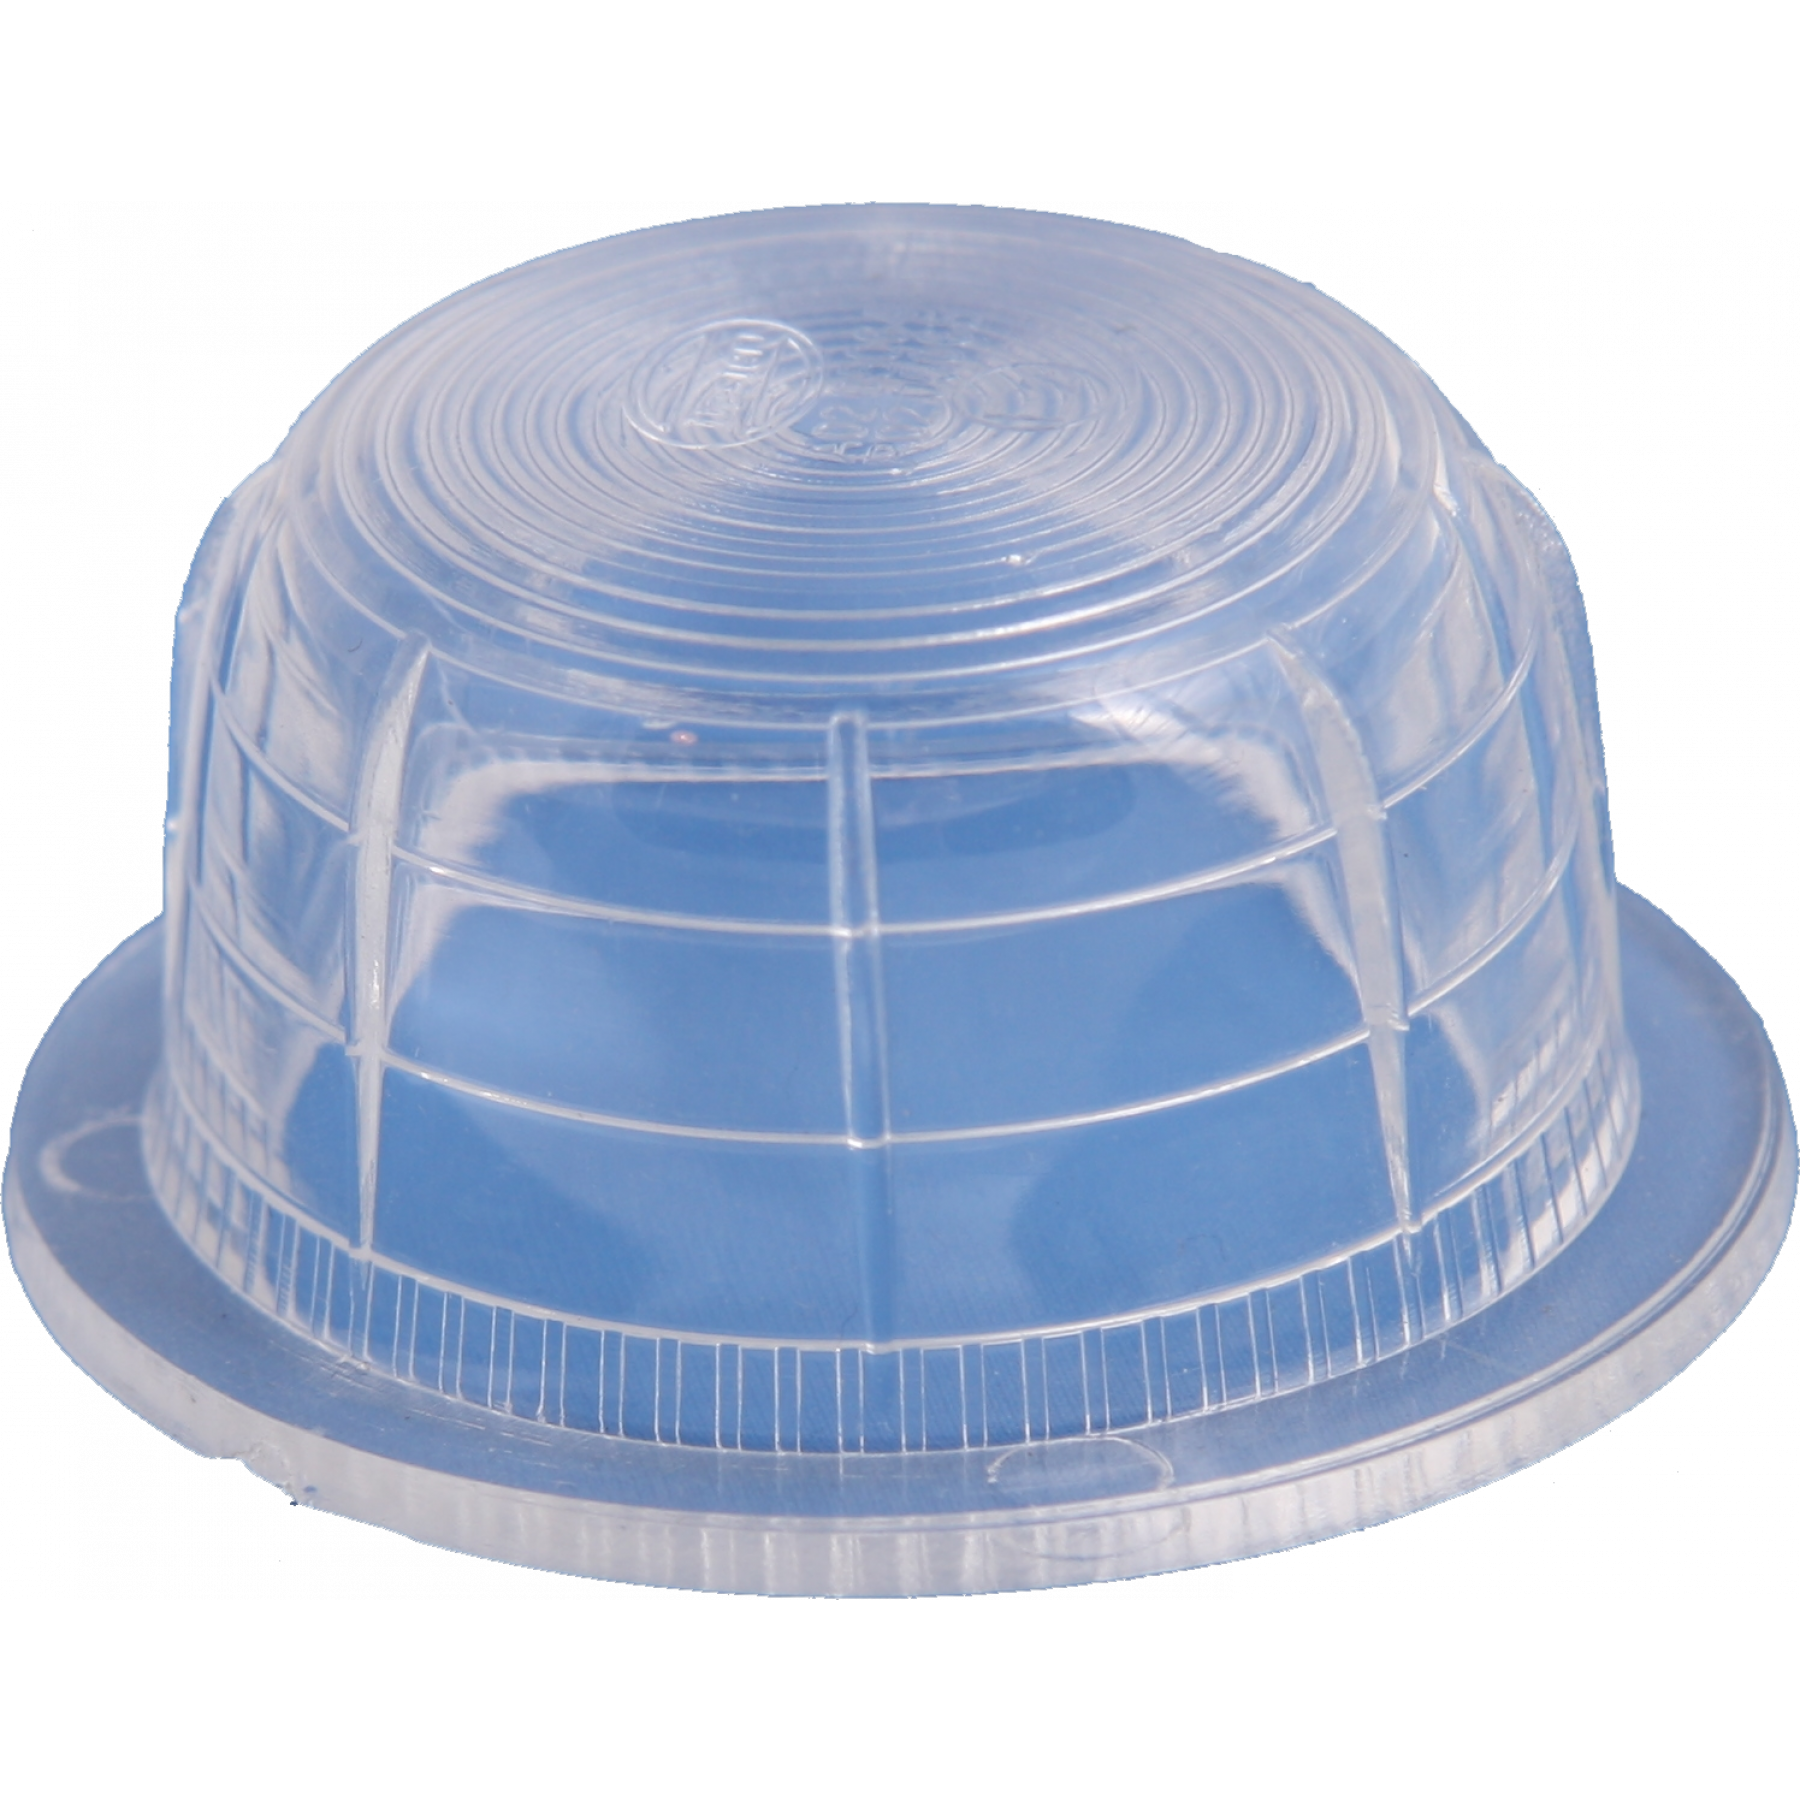 Reserveglas wit voor 22250150 (model 428 Dasteri)